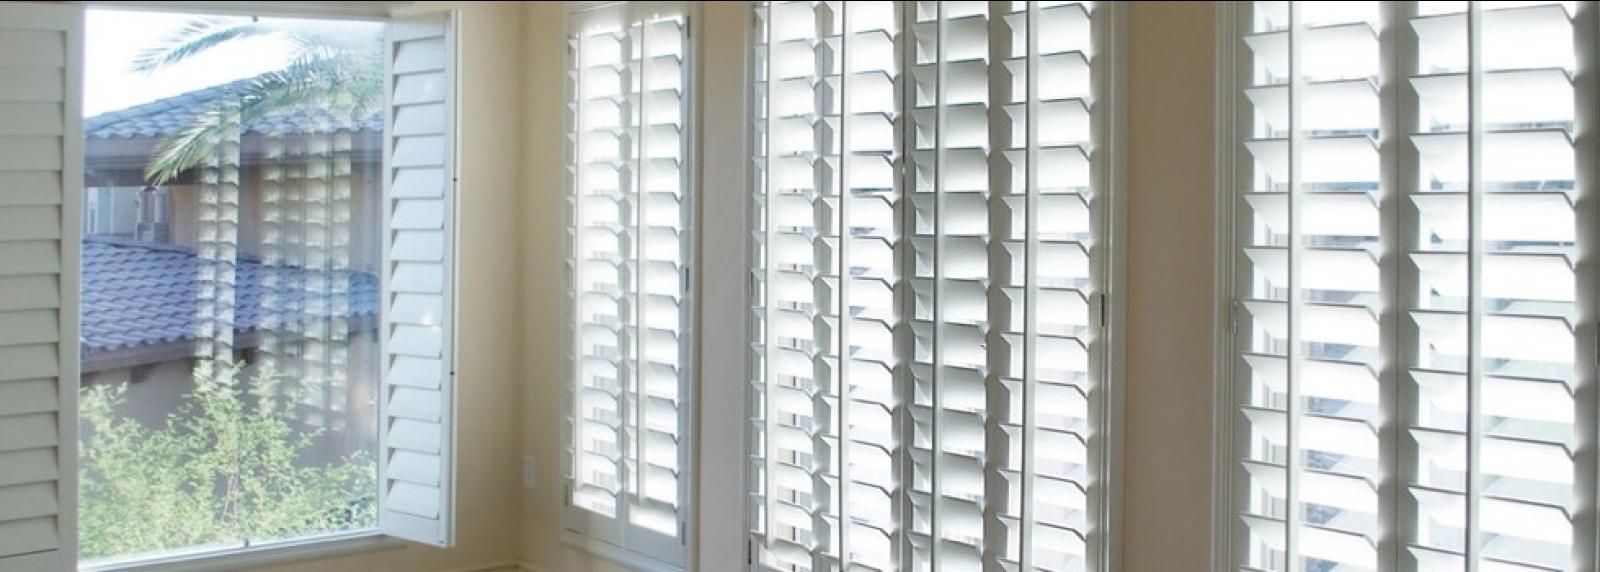 Signature Blinds Large_melbourne plantation shutters 2